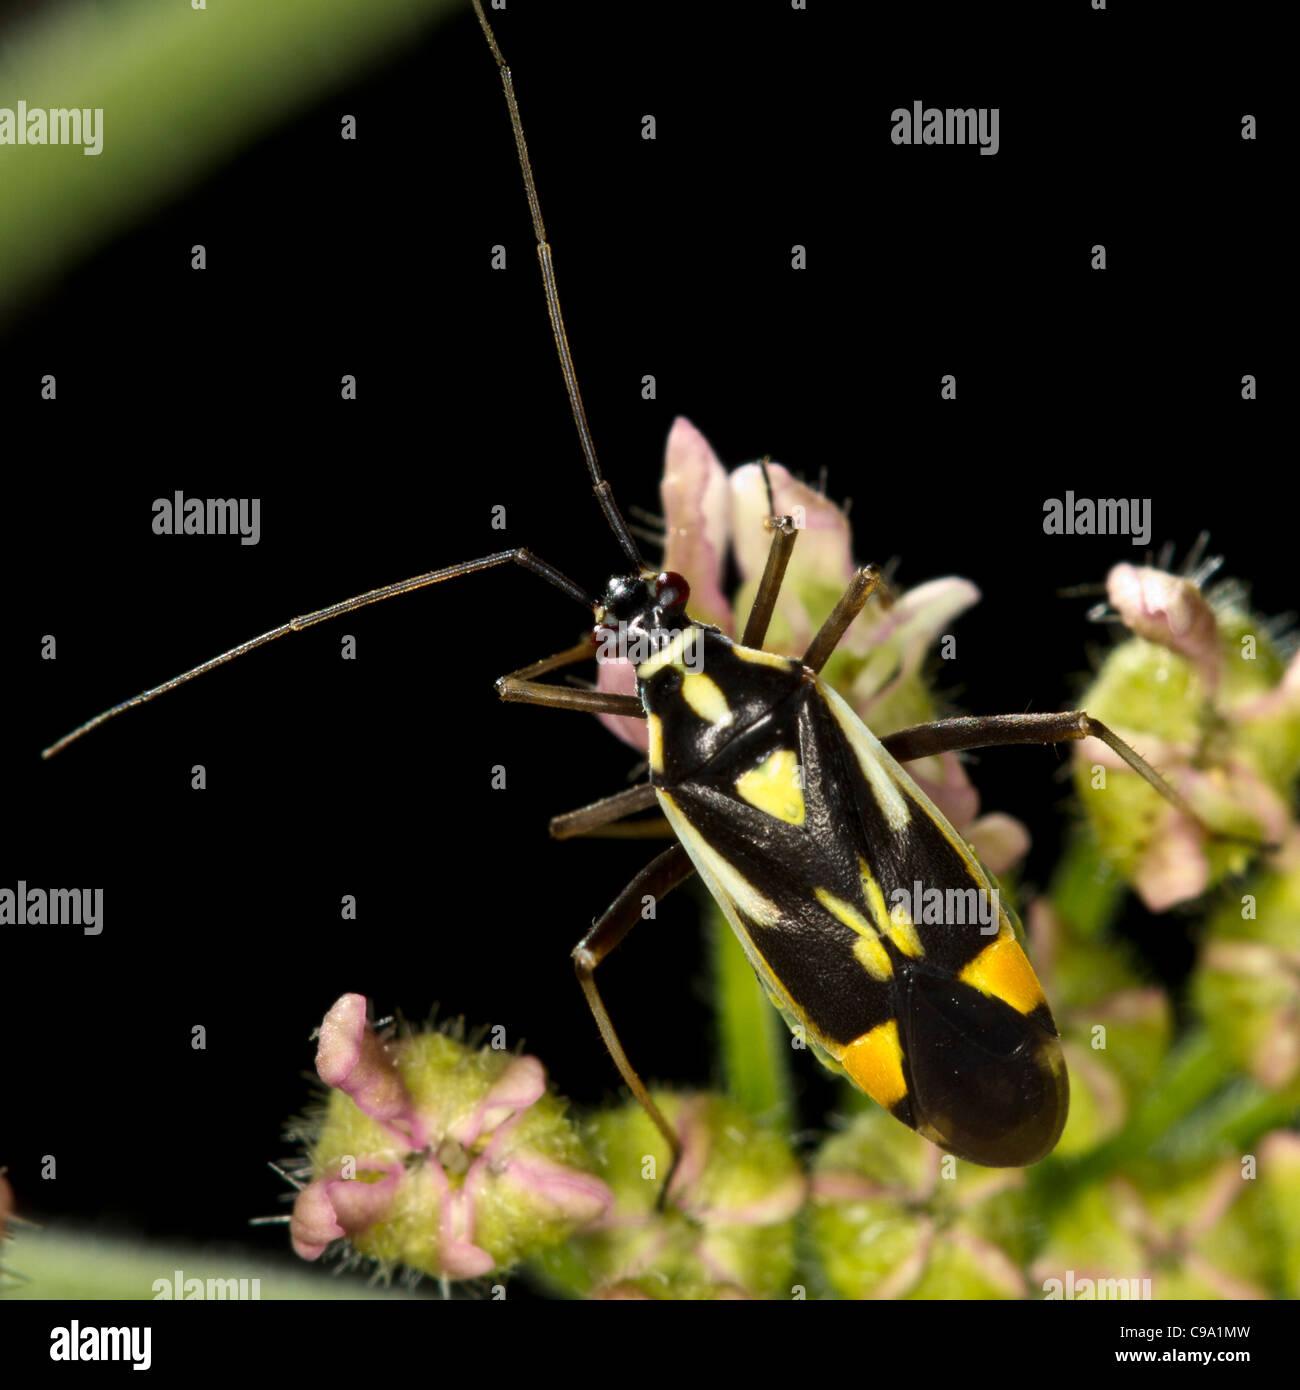 Capsid bug (Calocoris sexguttatus) - Stock Image